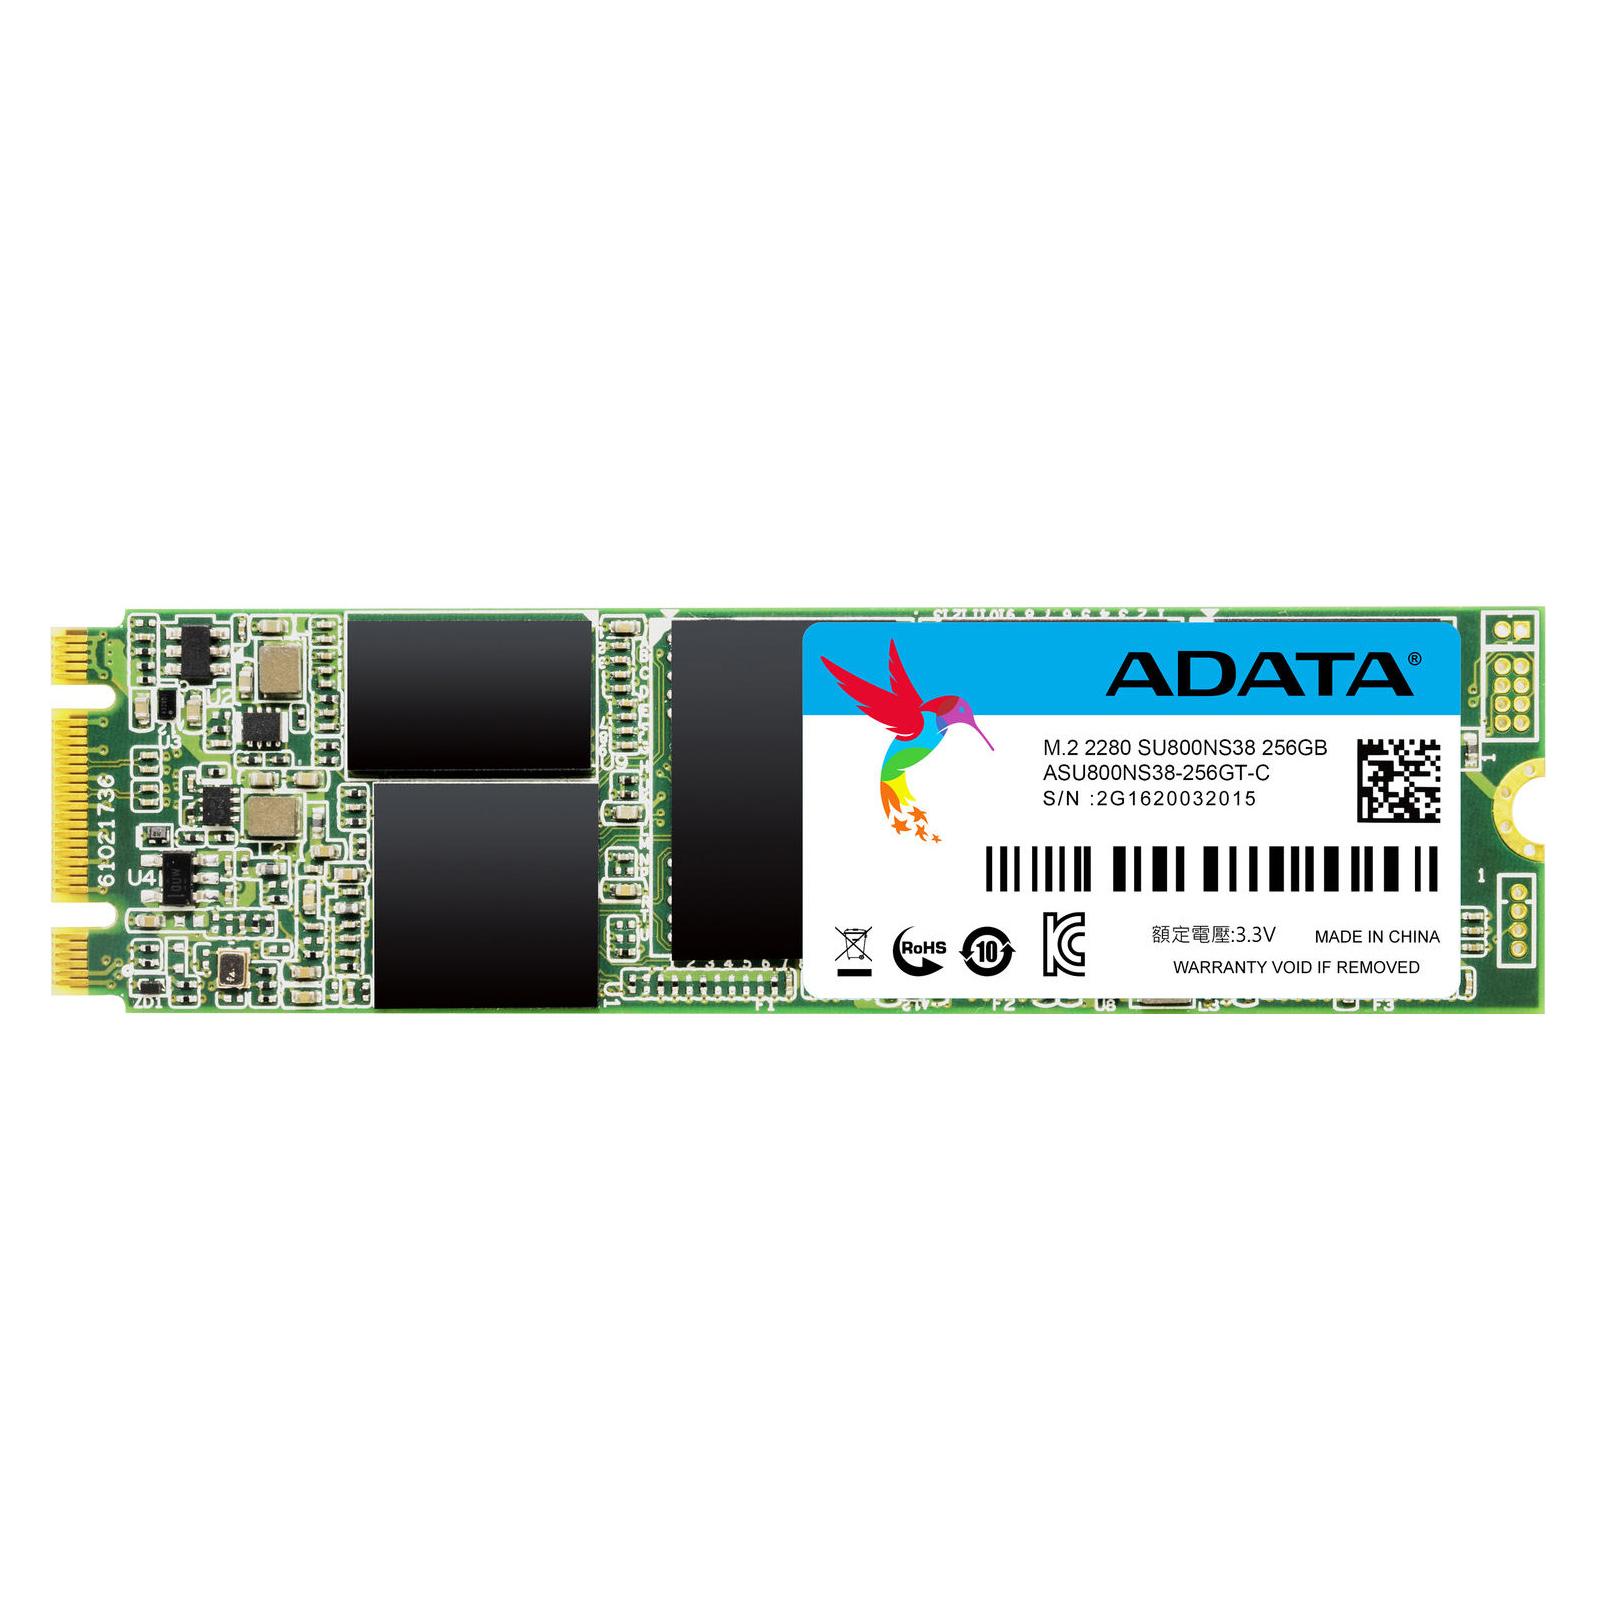 Накопитель SSD M.2 2280 1TB ADATA (ASU800NS38-1TT-C)